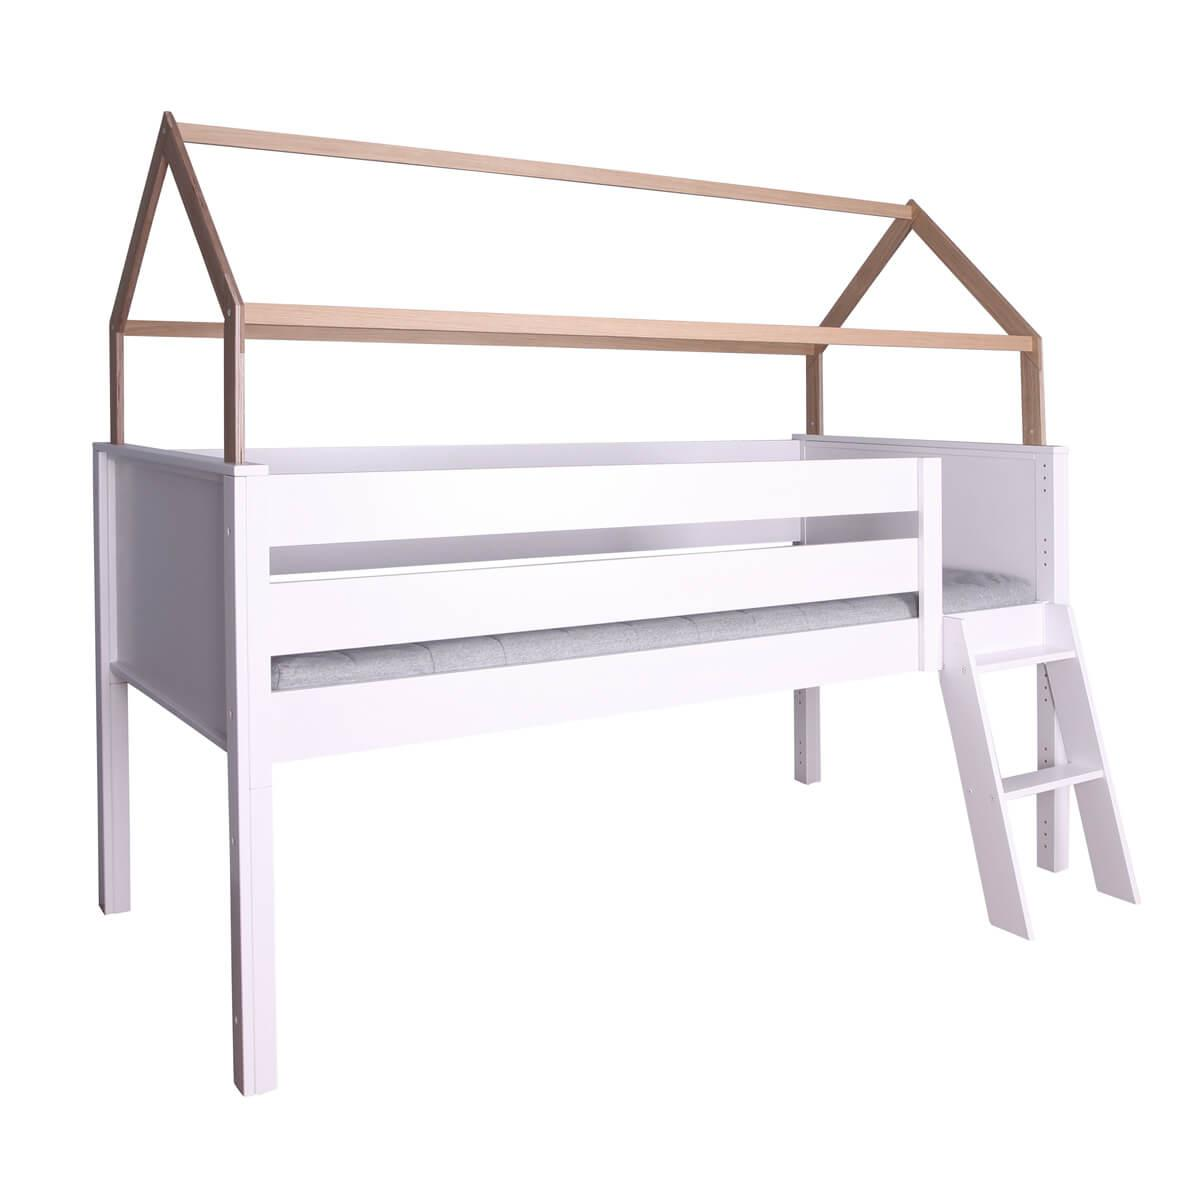 Hochbett-Dach halbhoch KASVA Buche massiv weiß-lackiert Eiche furniert-geölt